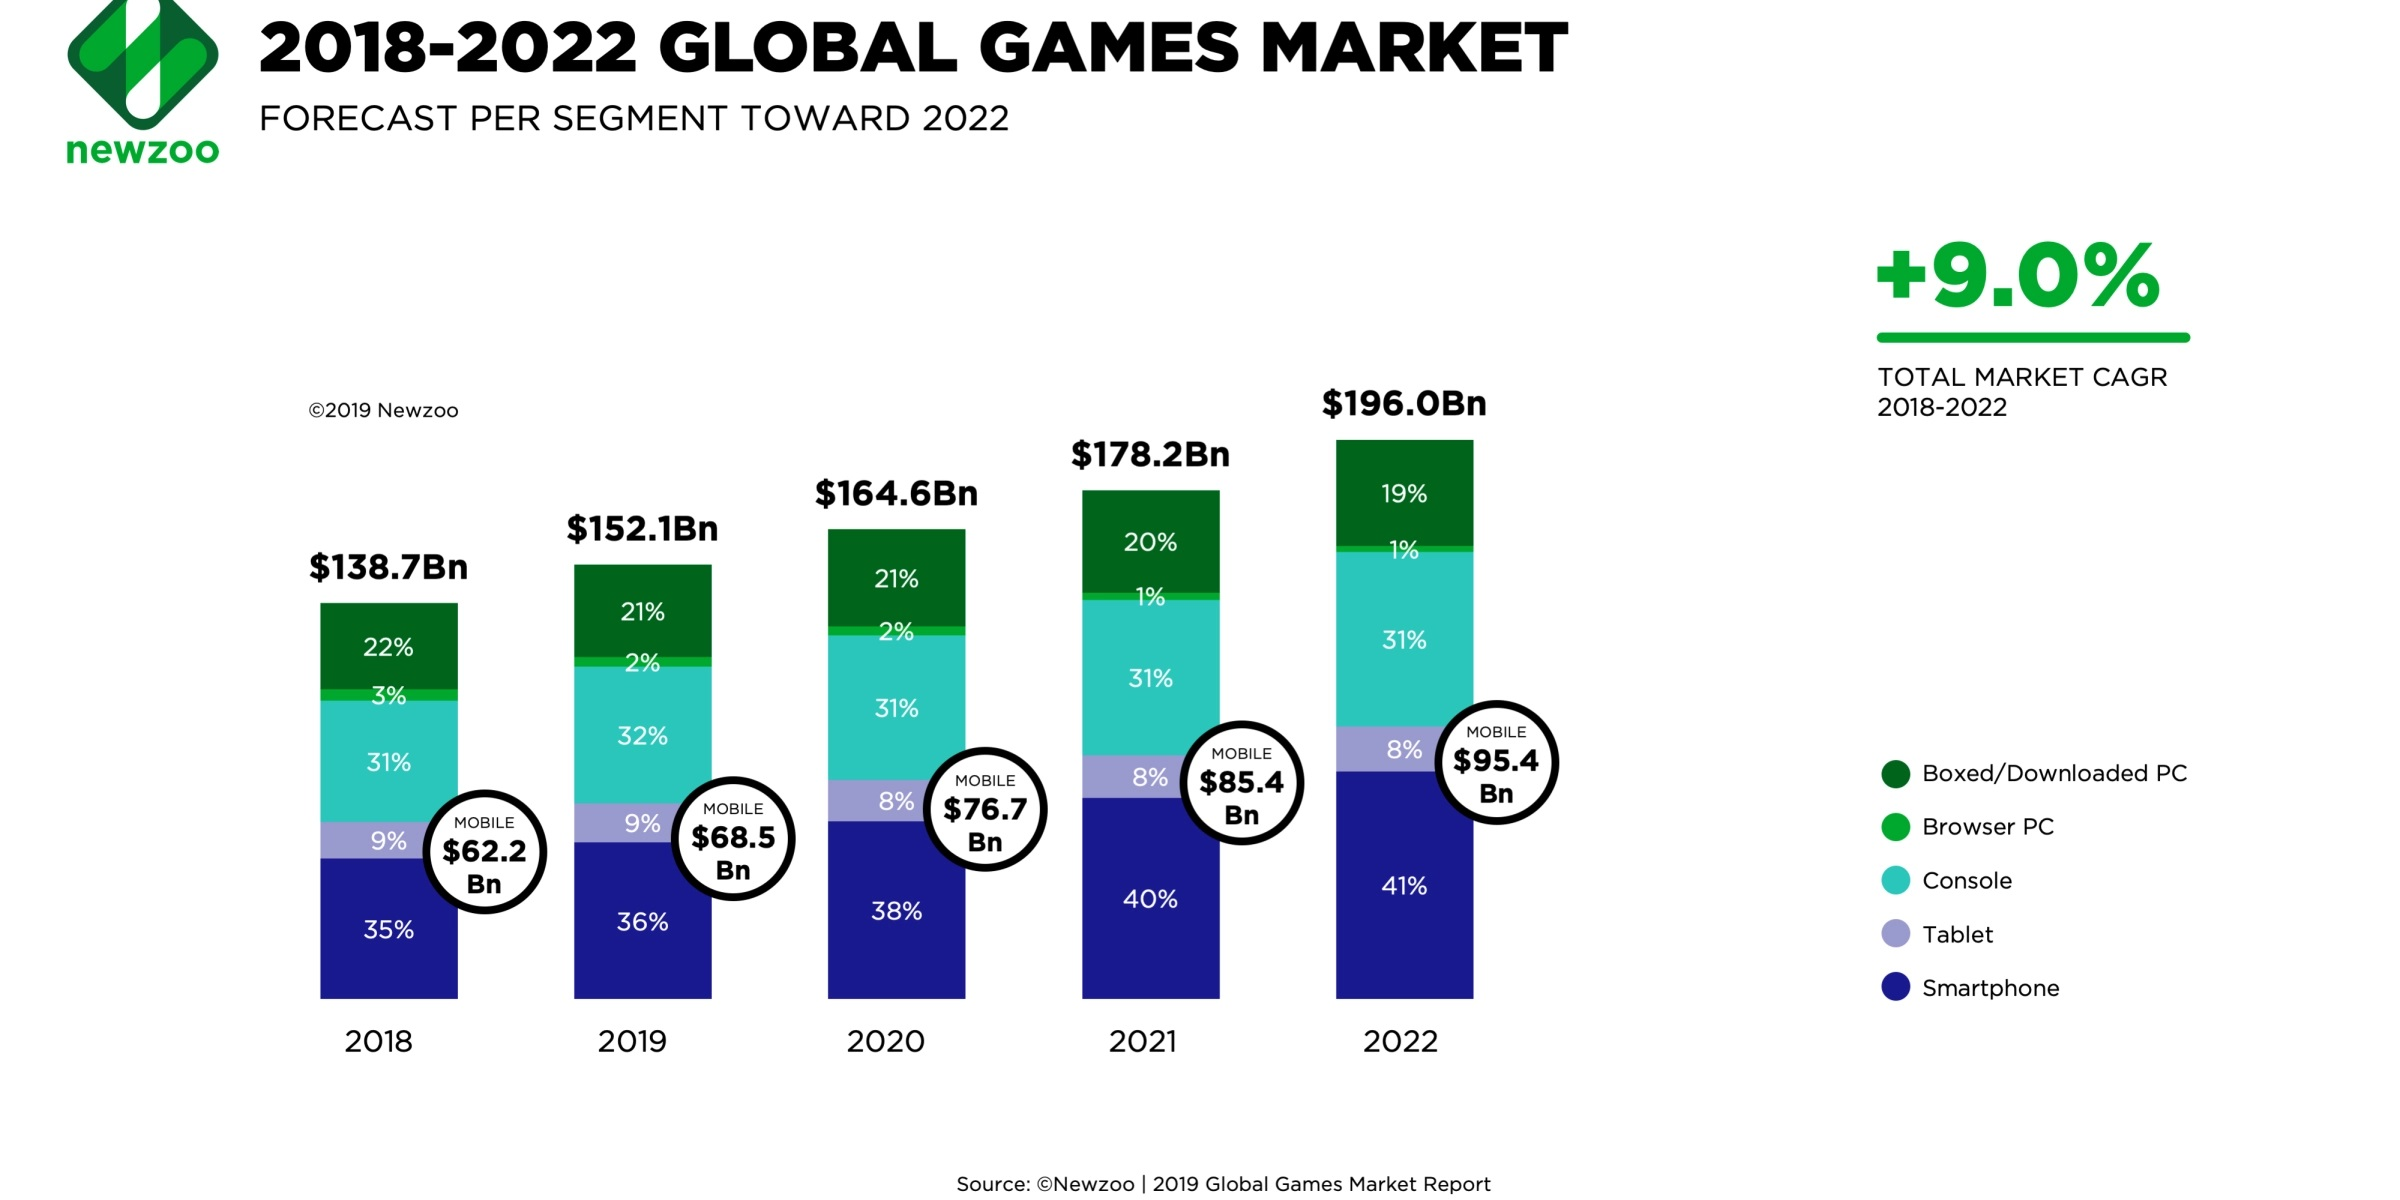 Newzoo-Global-Games-Market-2018-to-2022.jpg